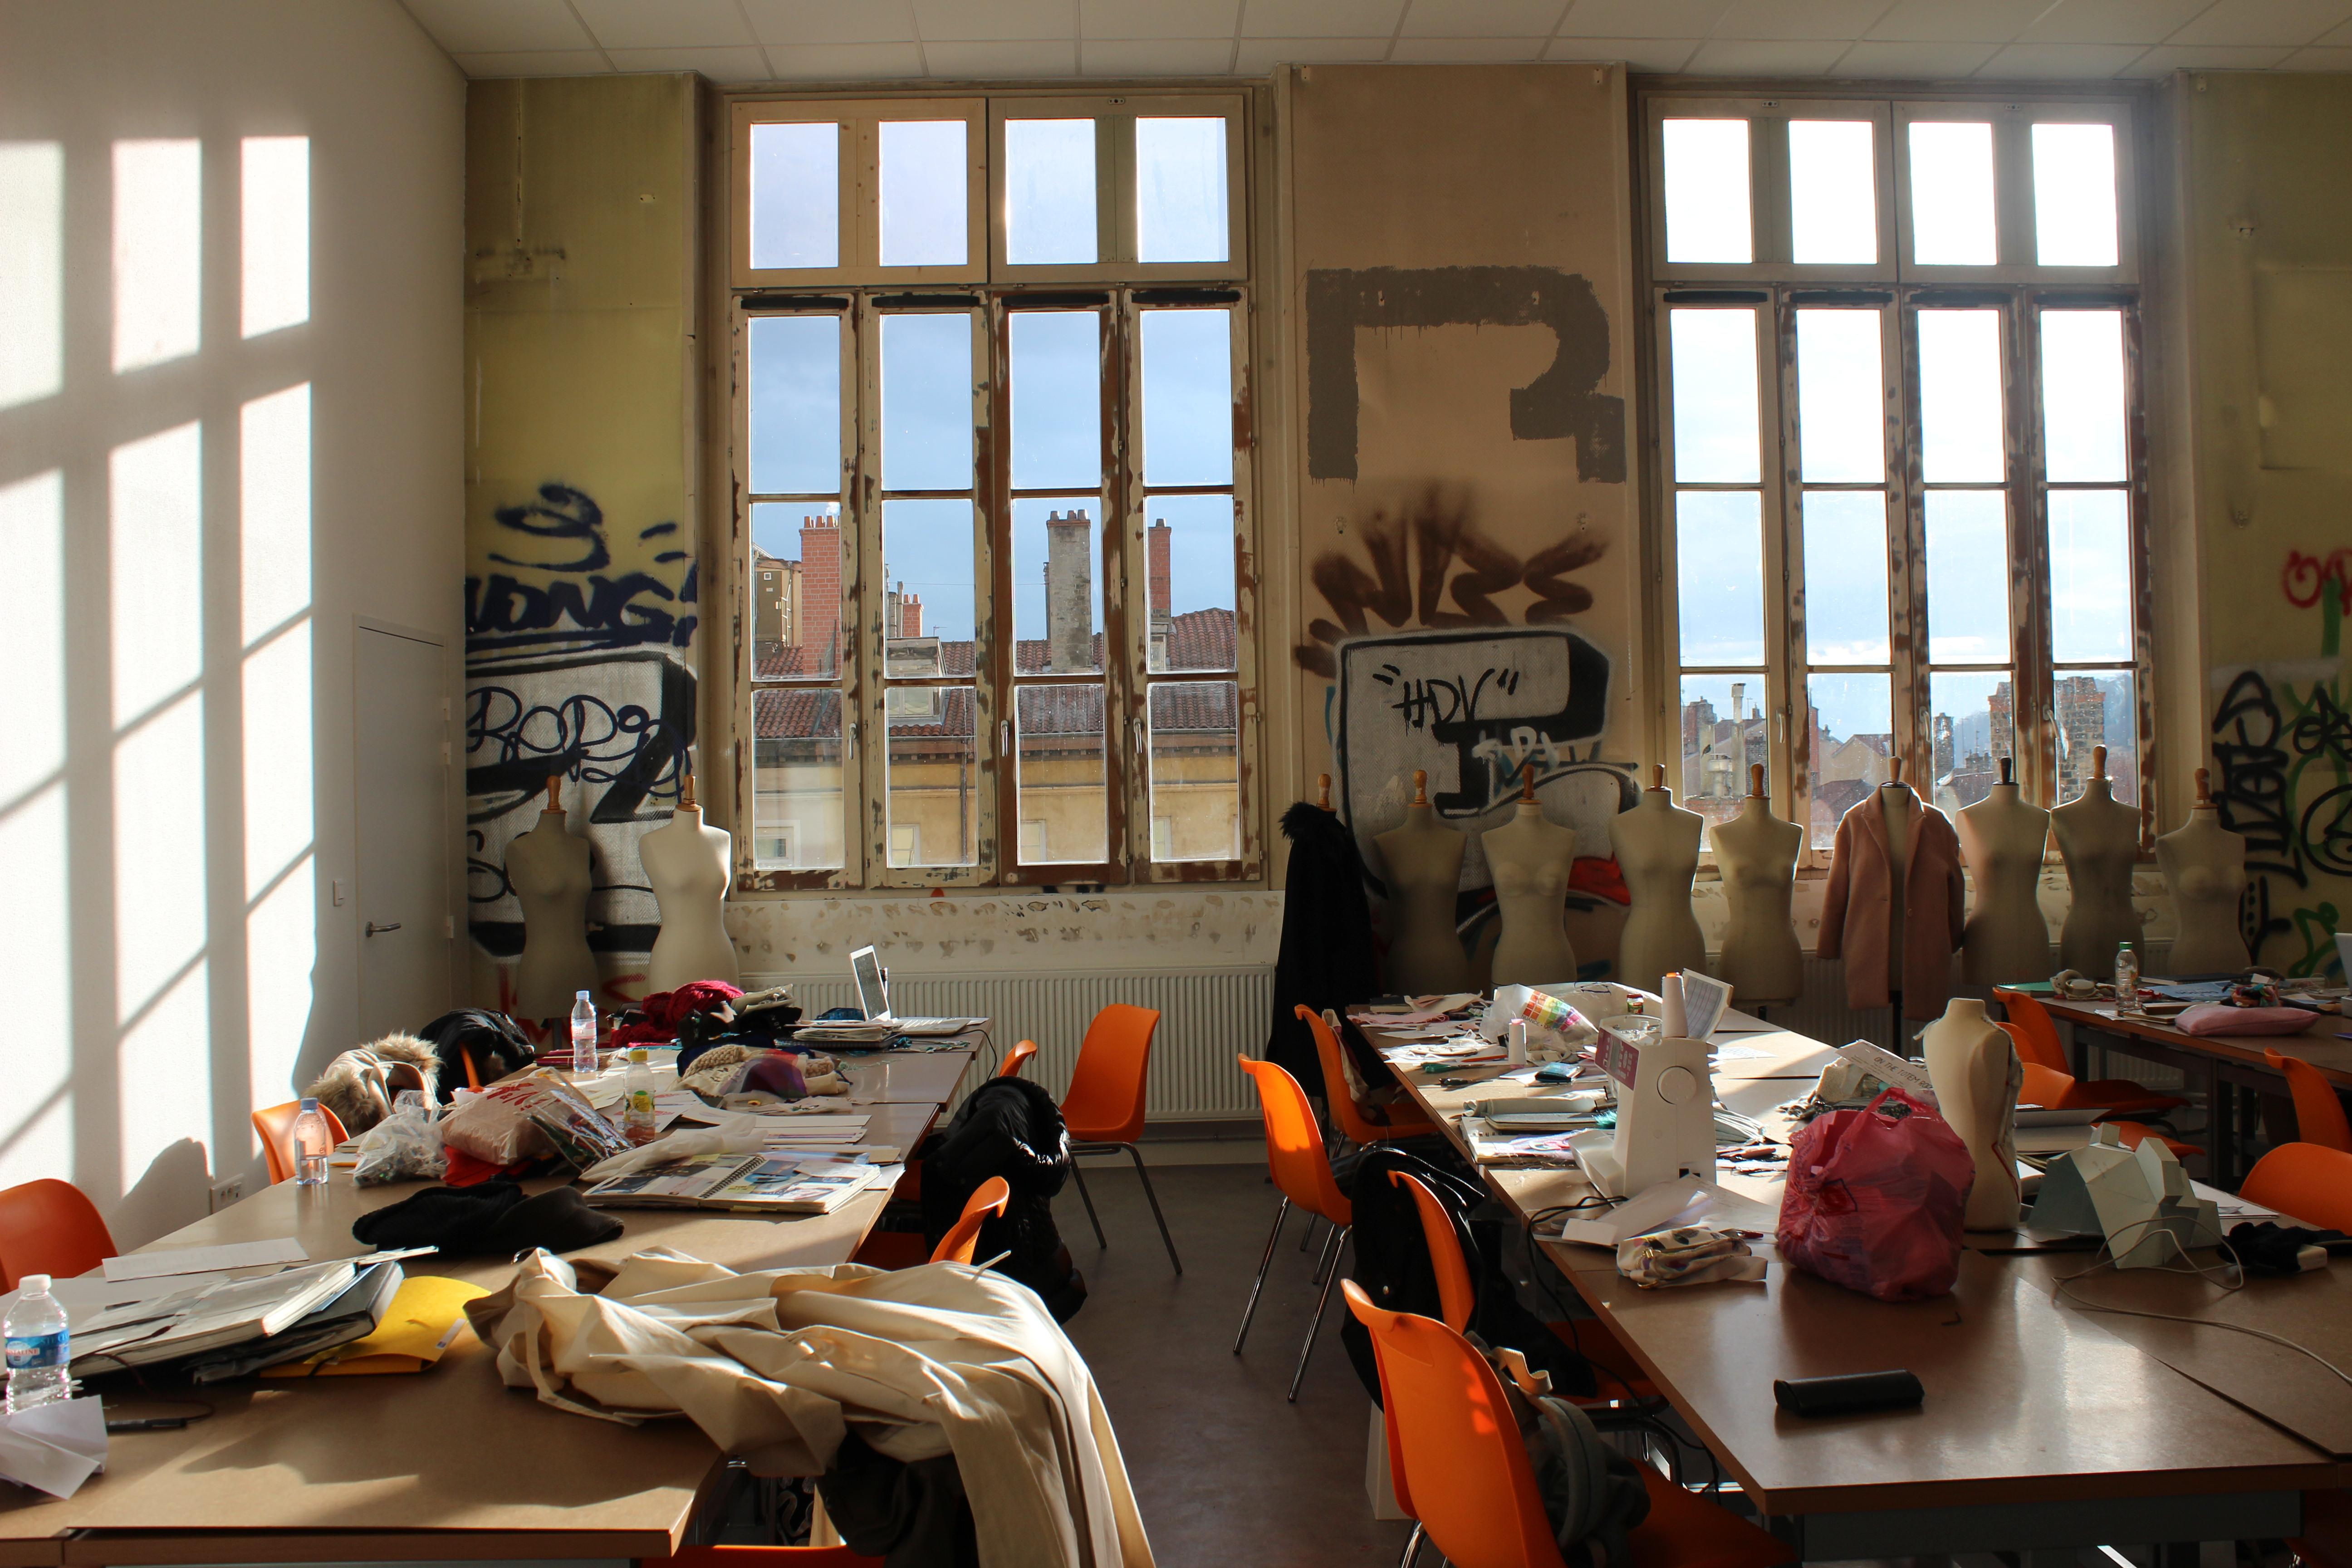 @Salle de classe ESMOD Lyon